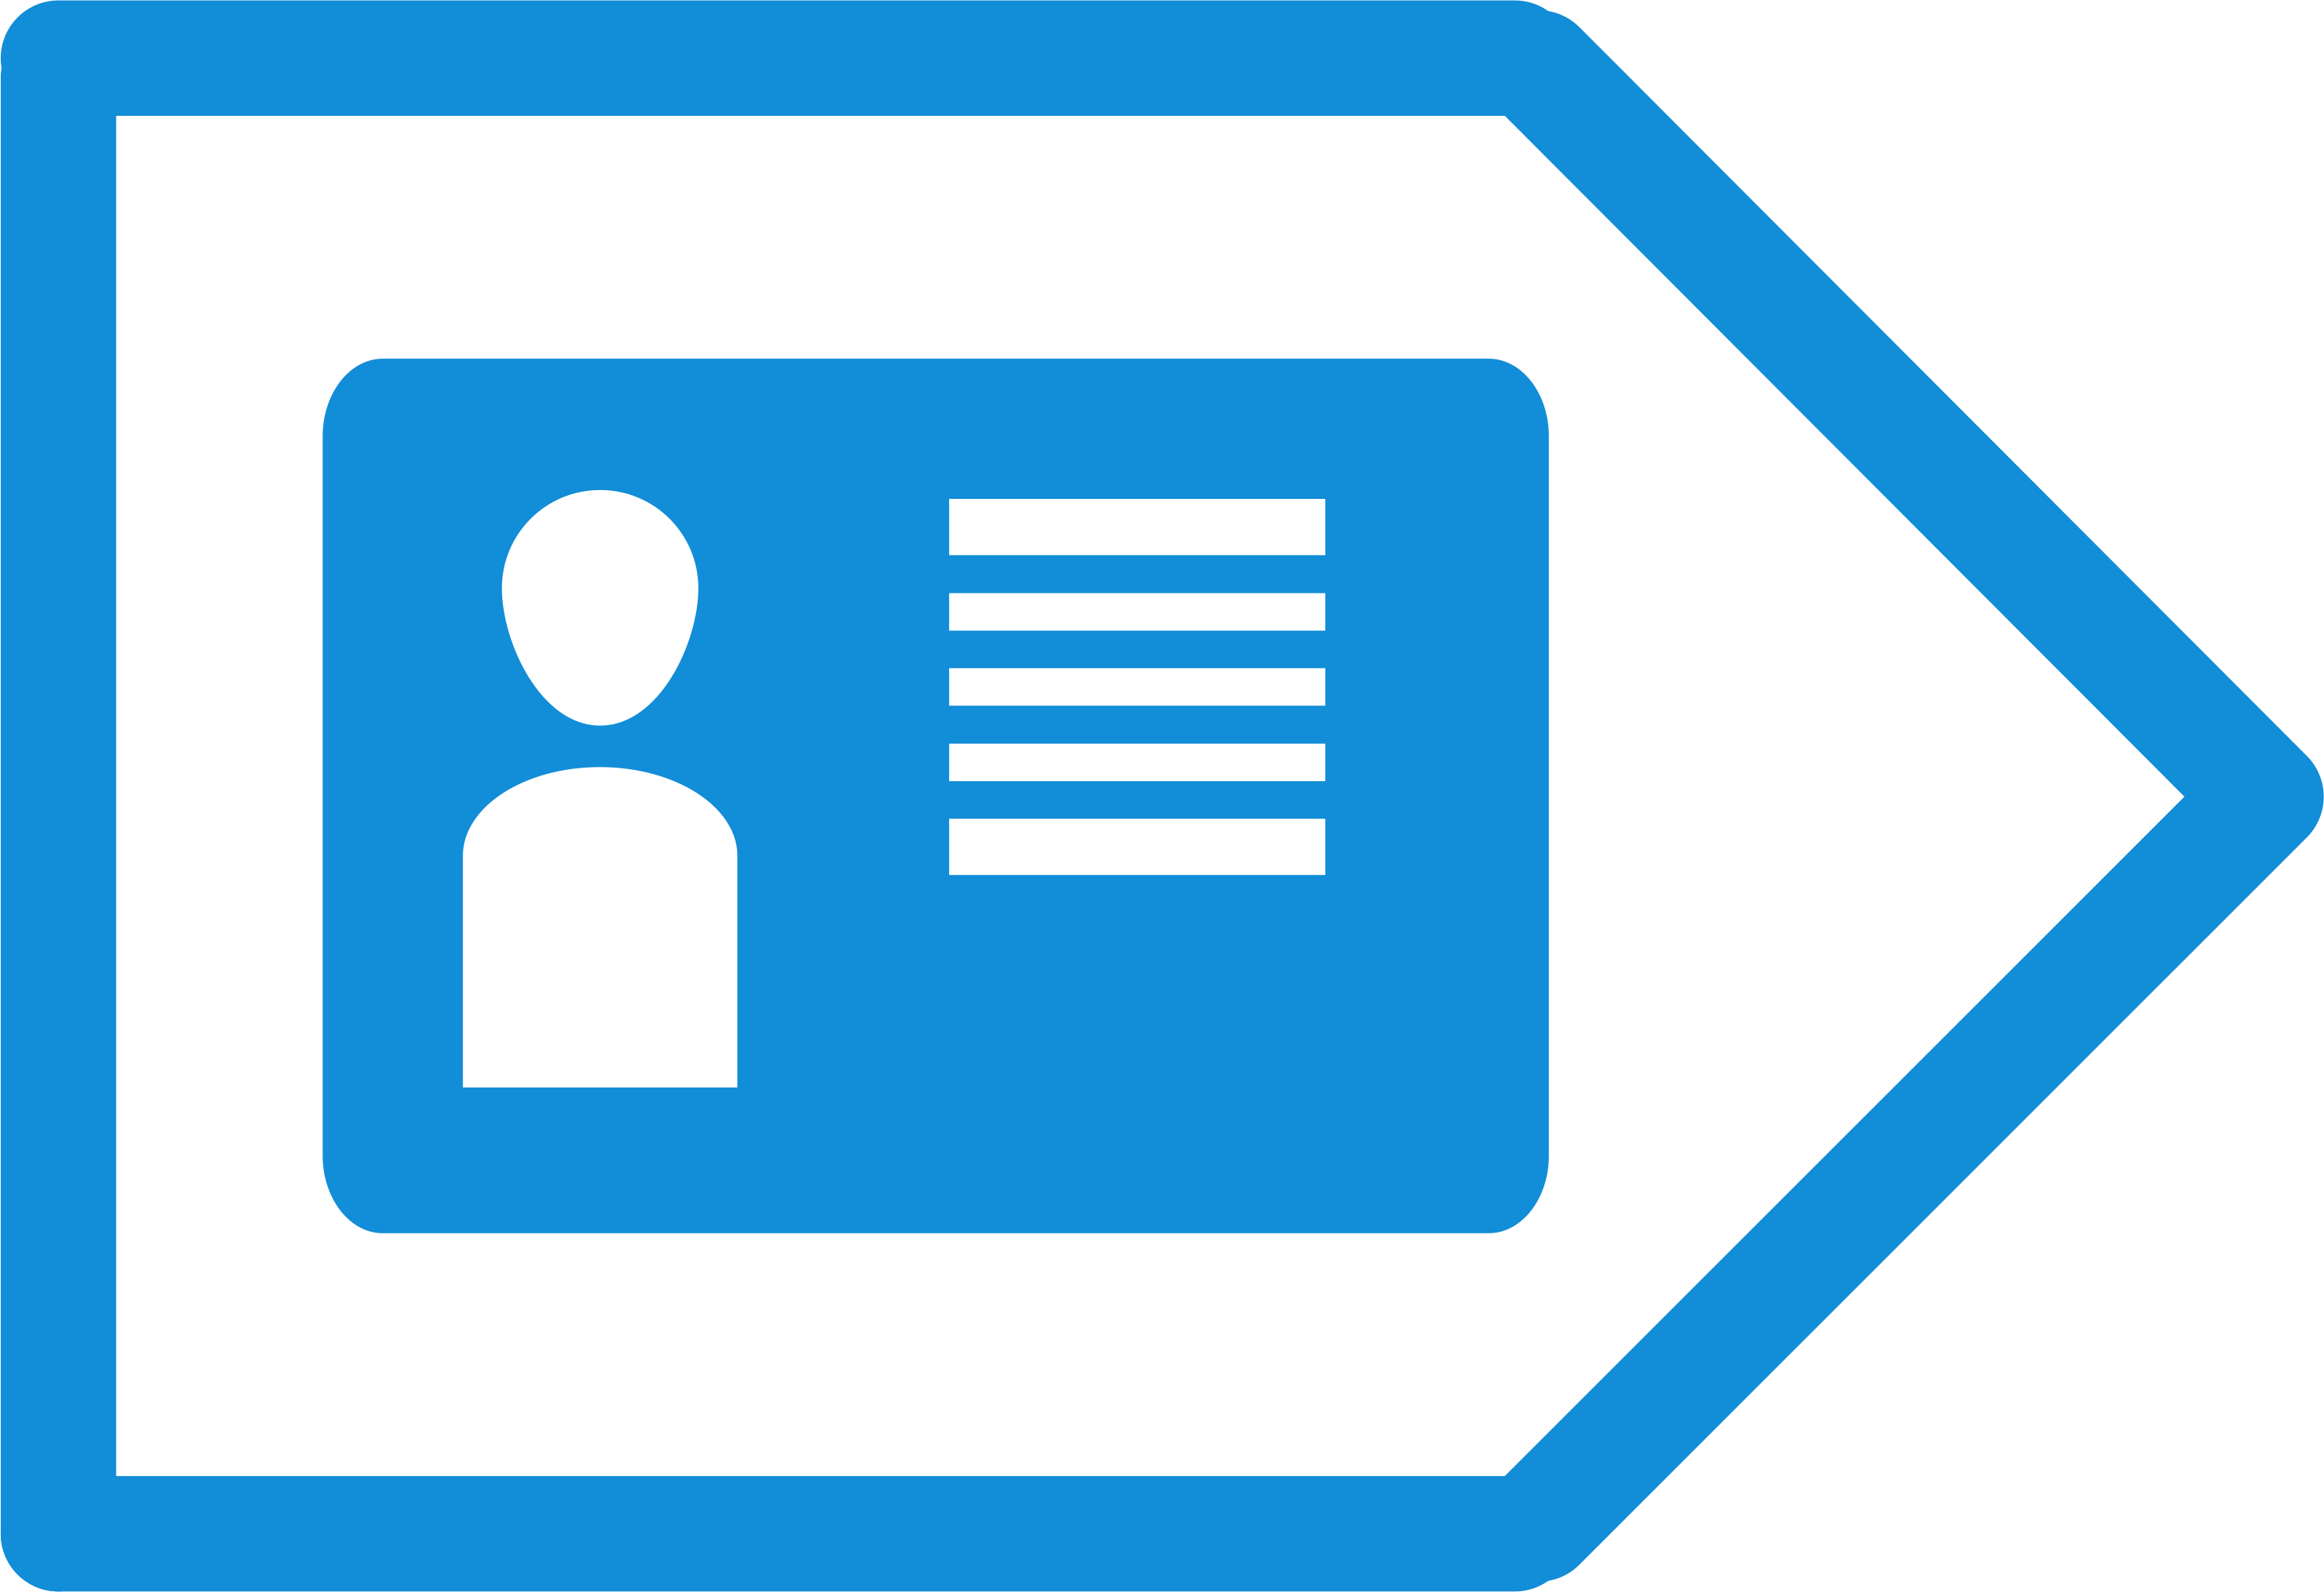 How to Apply for Grants | GRANTS.GOV